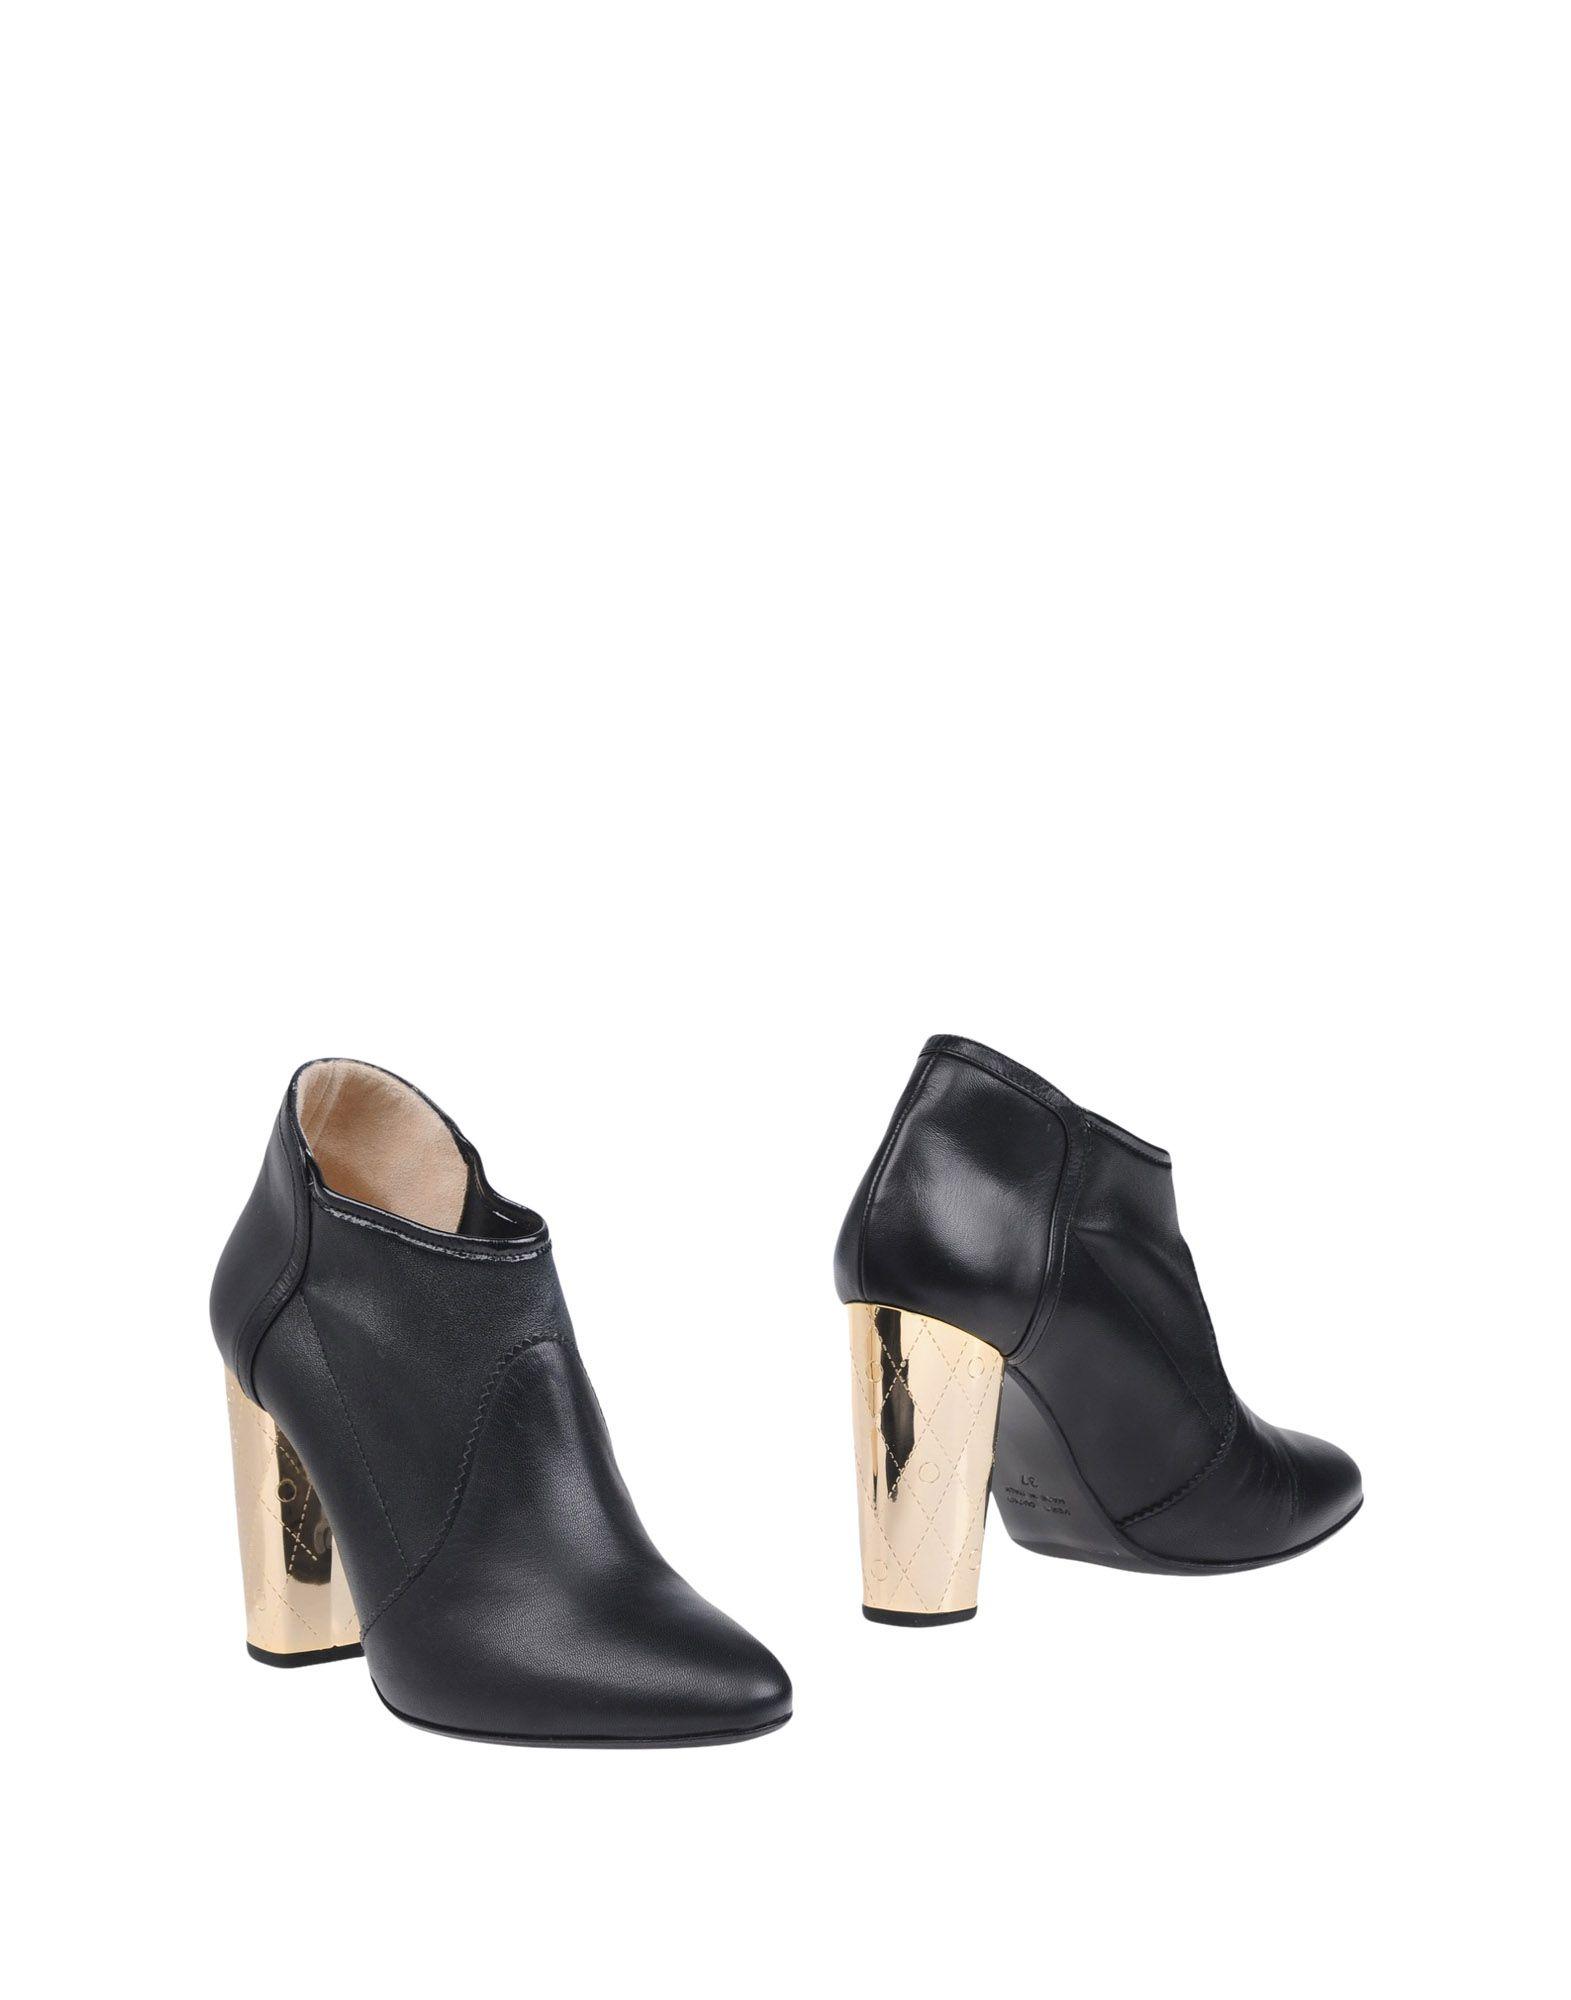 Rabatt Schuhe Fiorangelo Stiefelette Damen  11228745JN